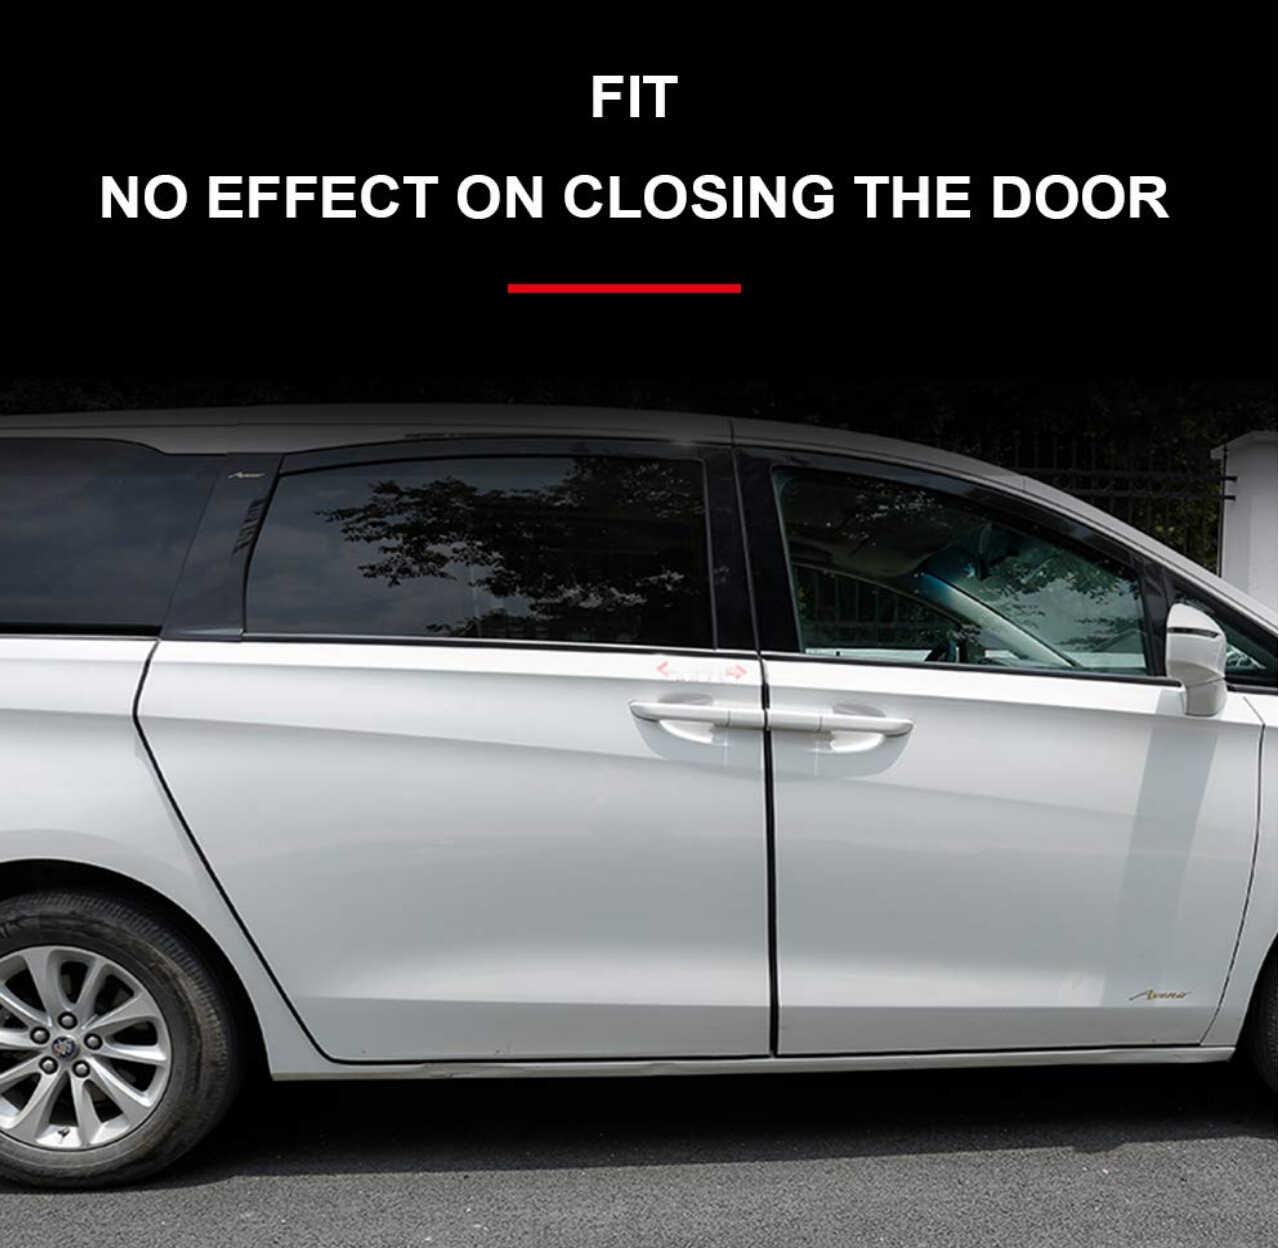 32Ft (10 м) двери автомобиля защитные насадки на края U Форма боковой обрез для Лада Гранта, калина Веста priora largus 2110 Smart Fortwo 2107 2106 2109 ВАЗ samara